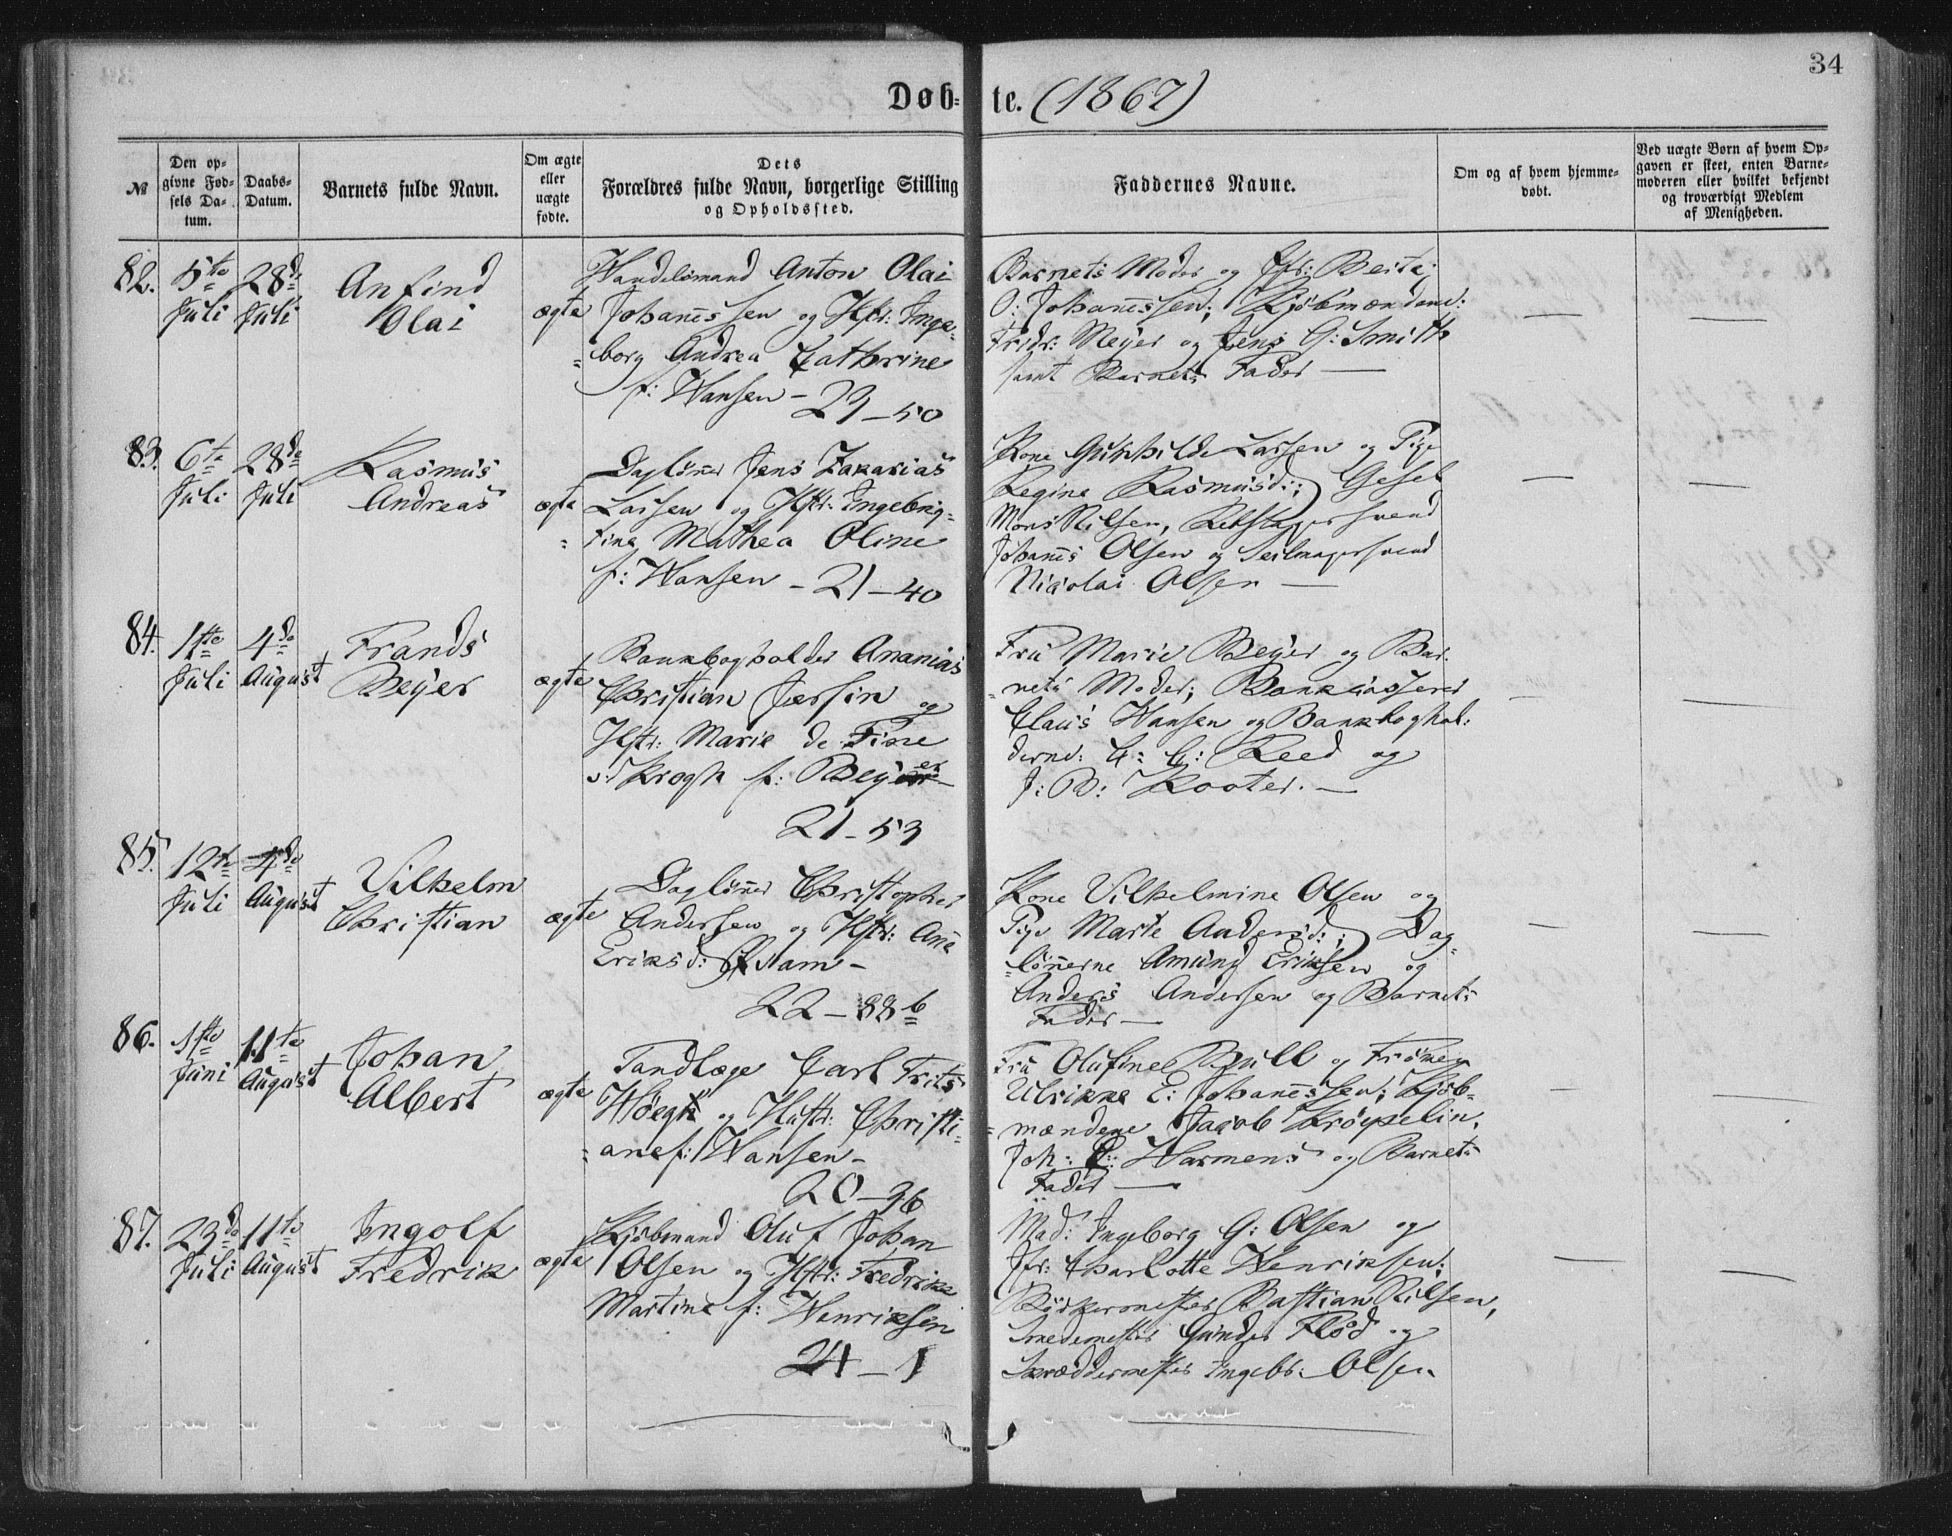 SAB, Korskirken Sokneprestembete, H/Haa/L0019: Ministerialbok nr. B 5, 1866-1871, s. 34